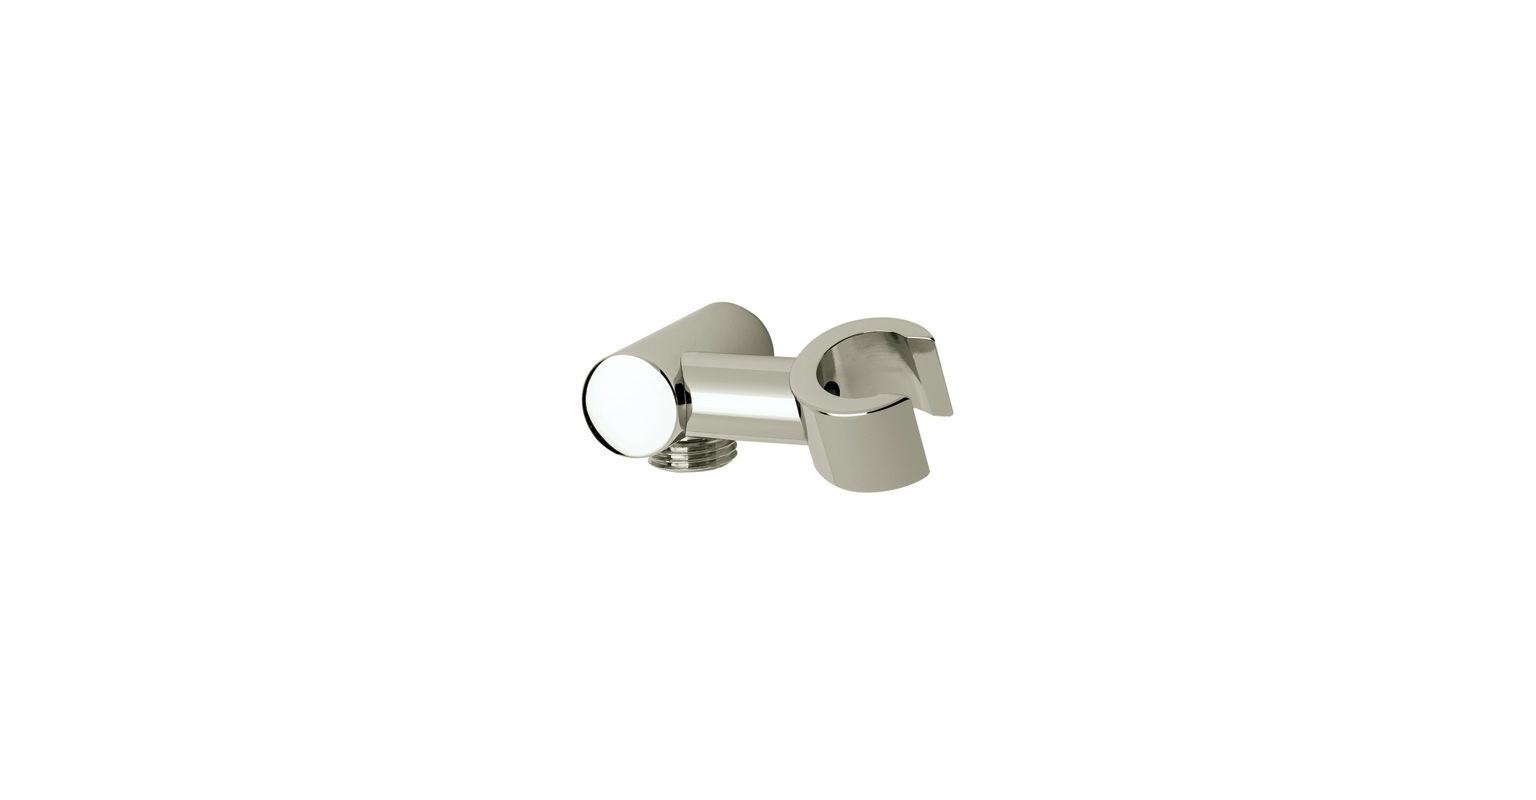 CYLINDRIC PIVOTING Hand Shower Holder Satin Nickel